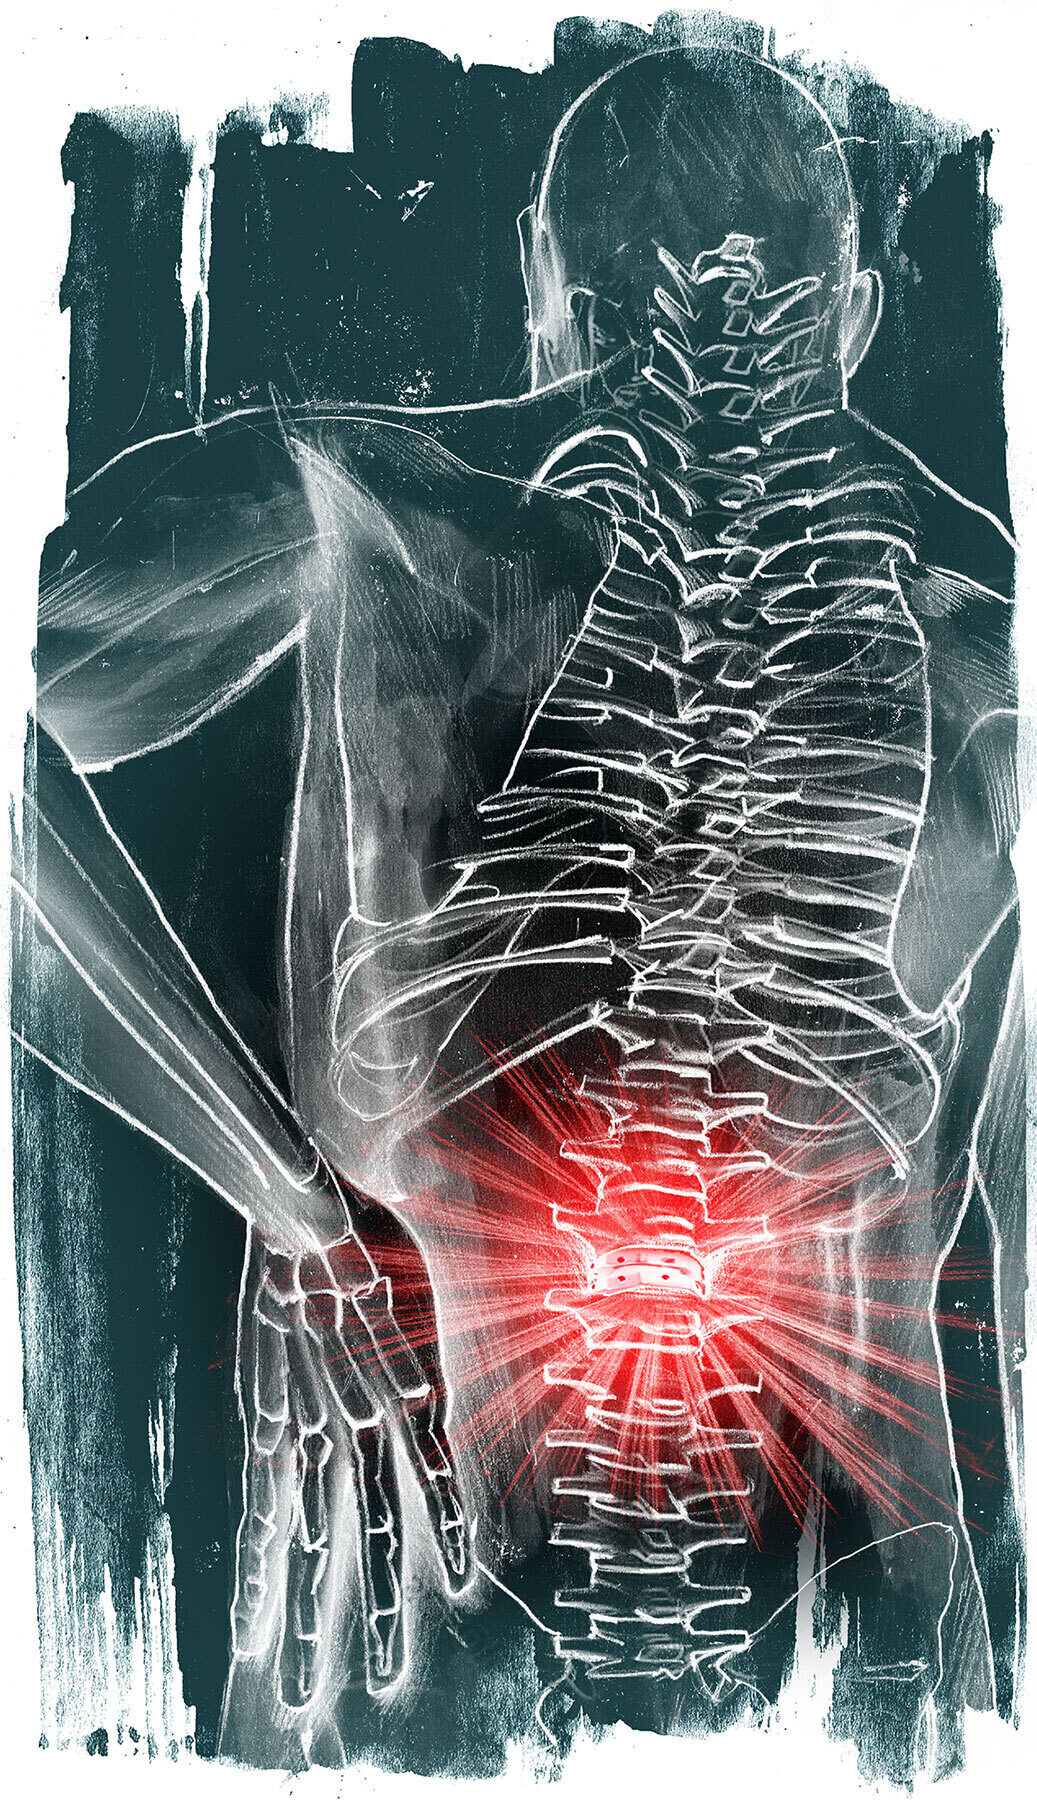 Implantate ruecken illustration - Kornel Illustration | Kornel Stadler portfolio